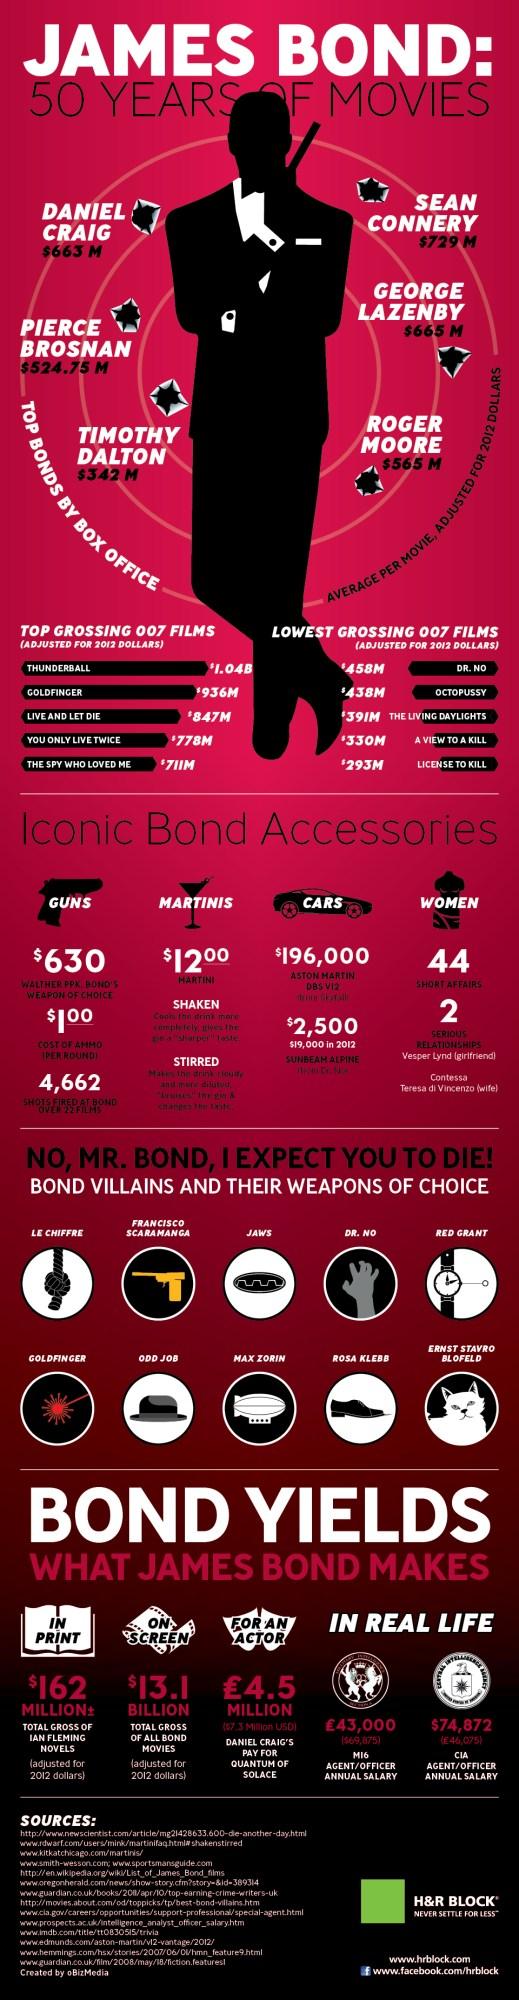 James-Bond-50-Years-of-Movies